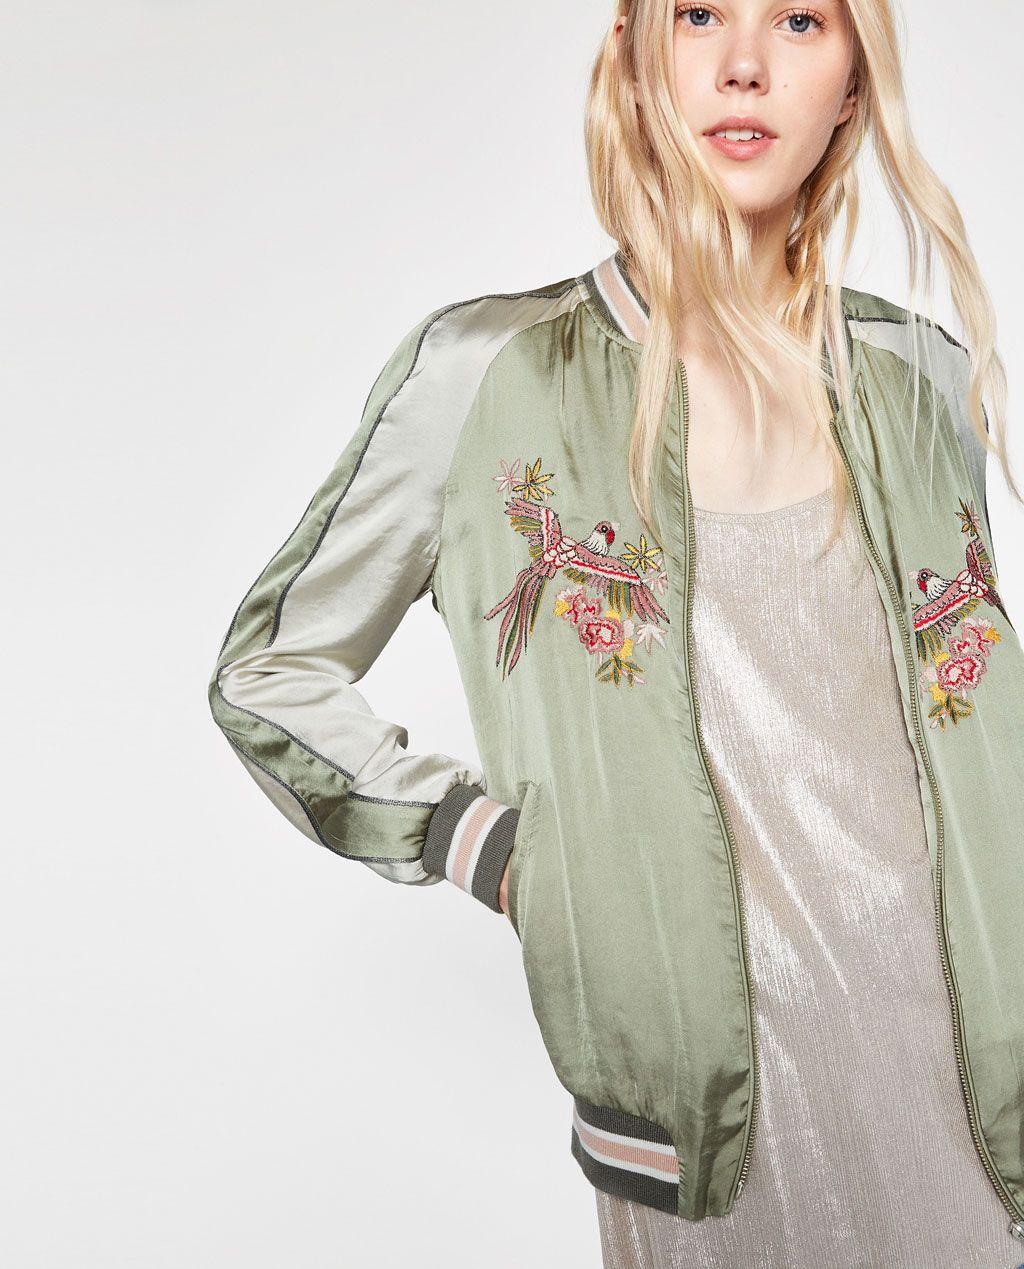 Resultado de imagen para bombers jacket women tendency